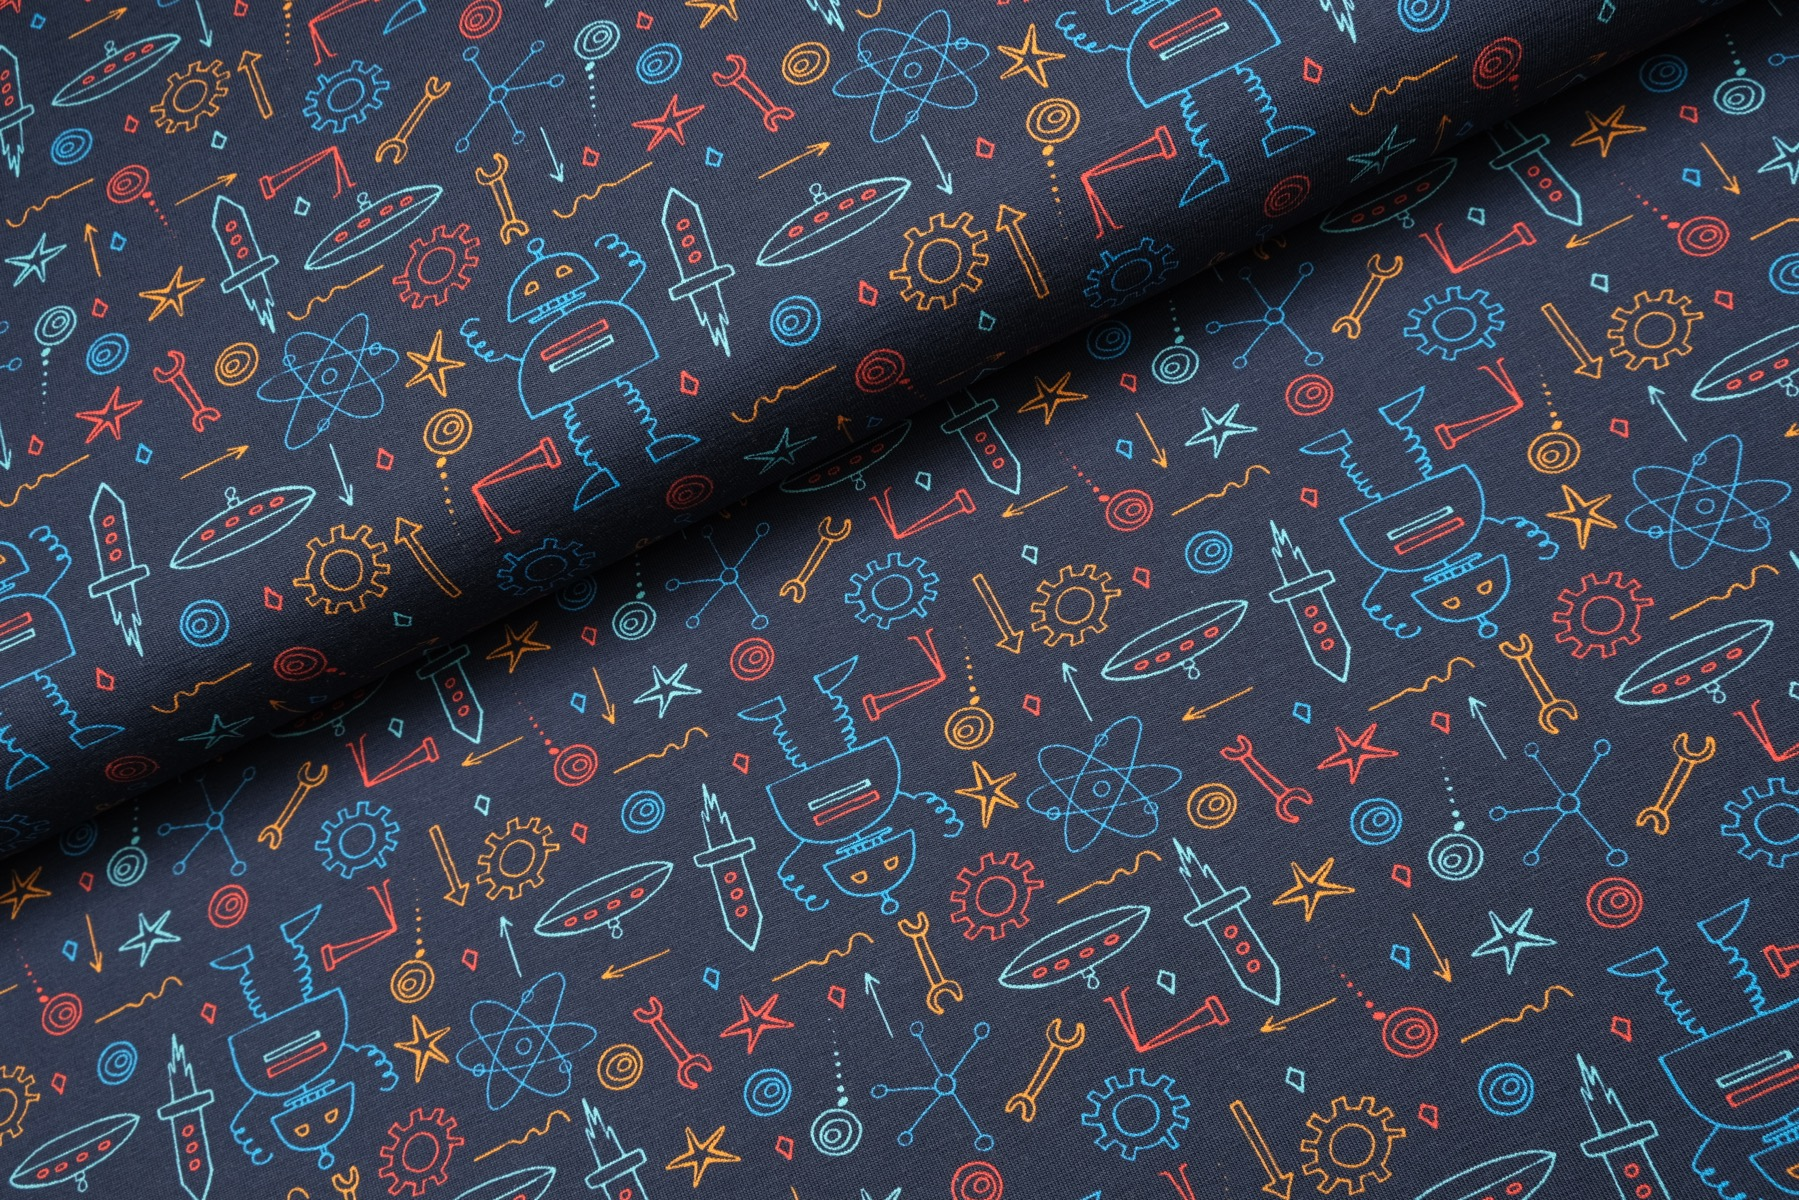 Robot Fun Tricot Navy - Megan Blue Fabrics